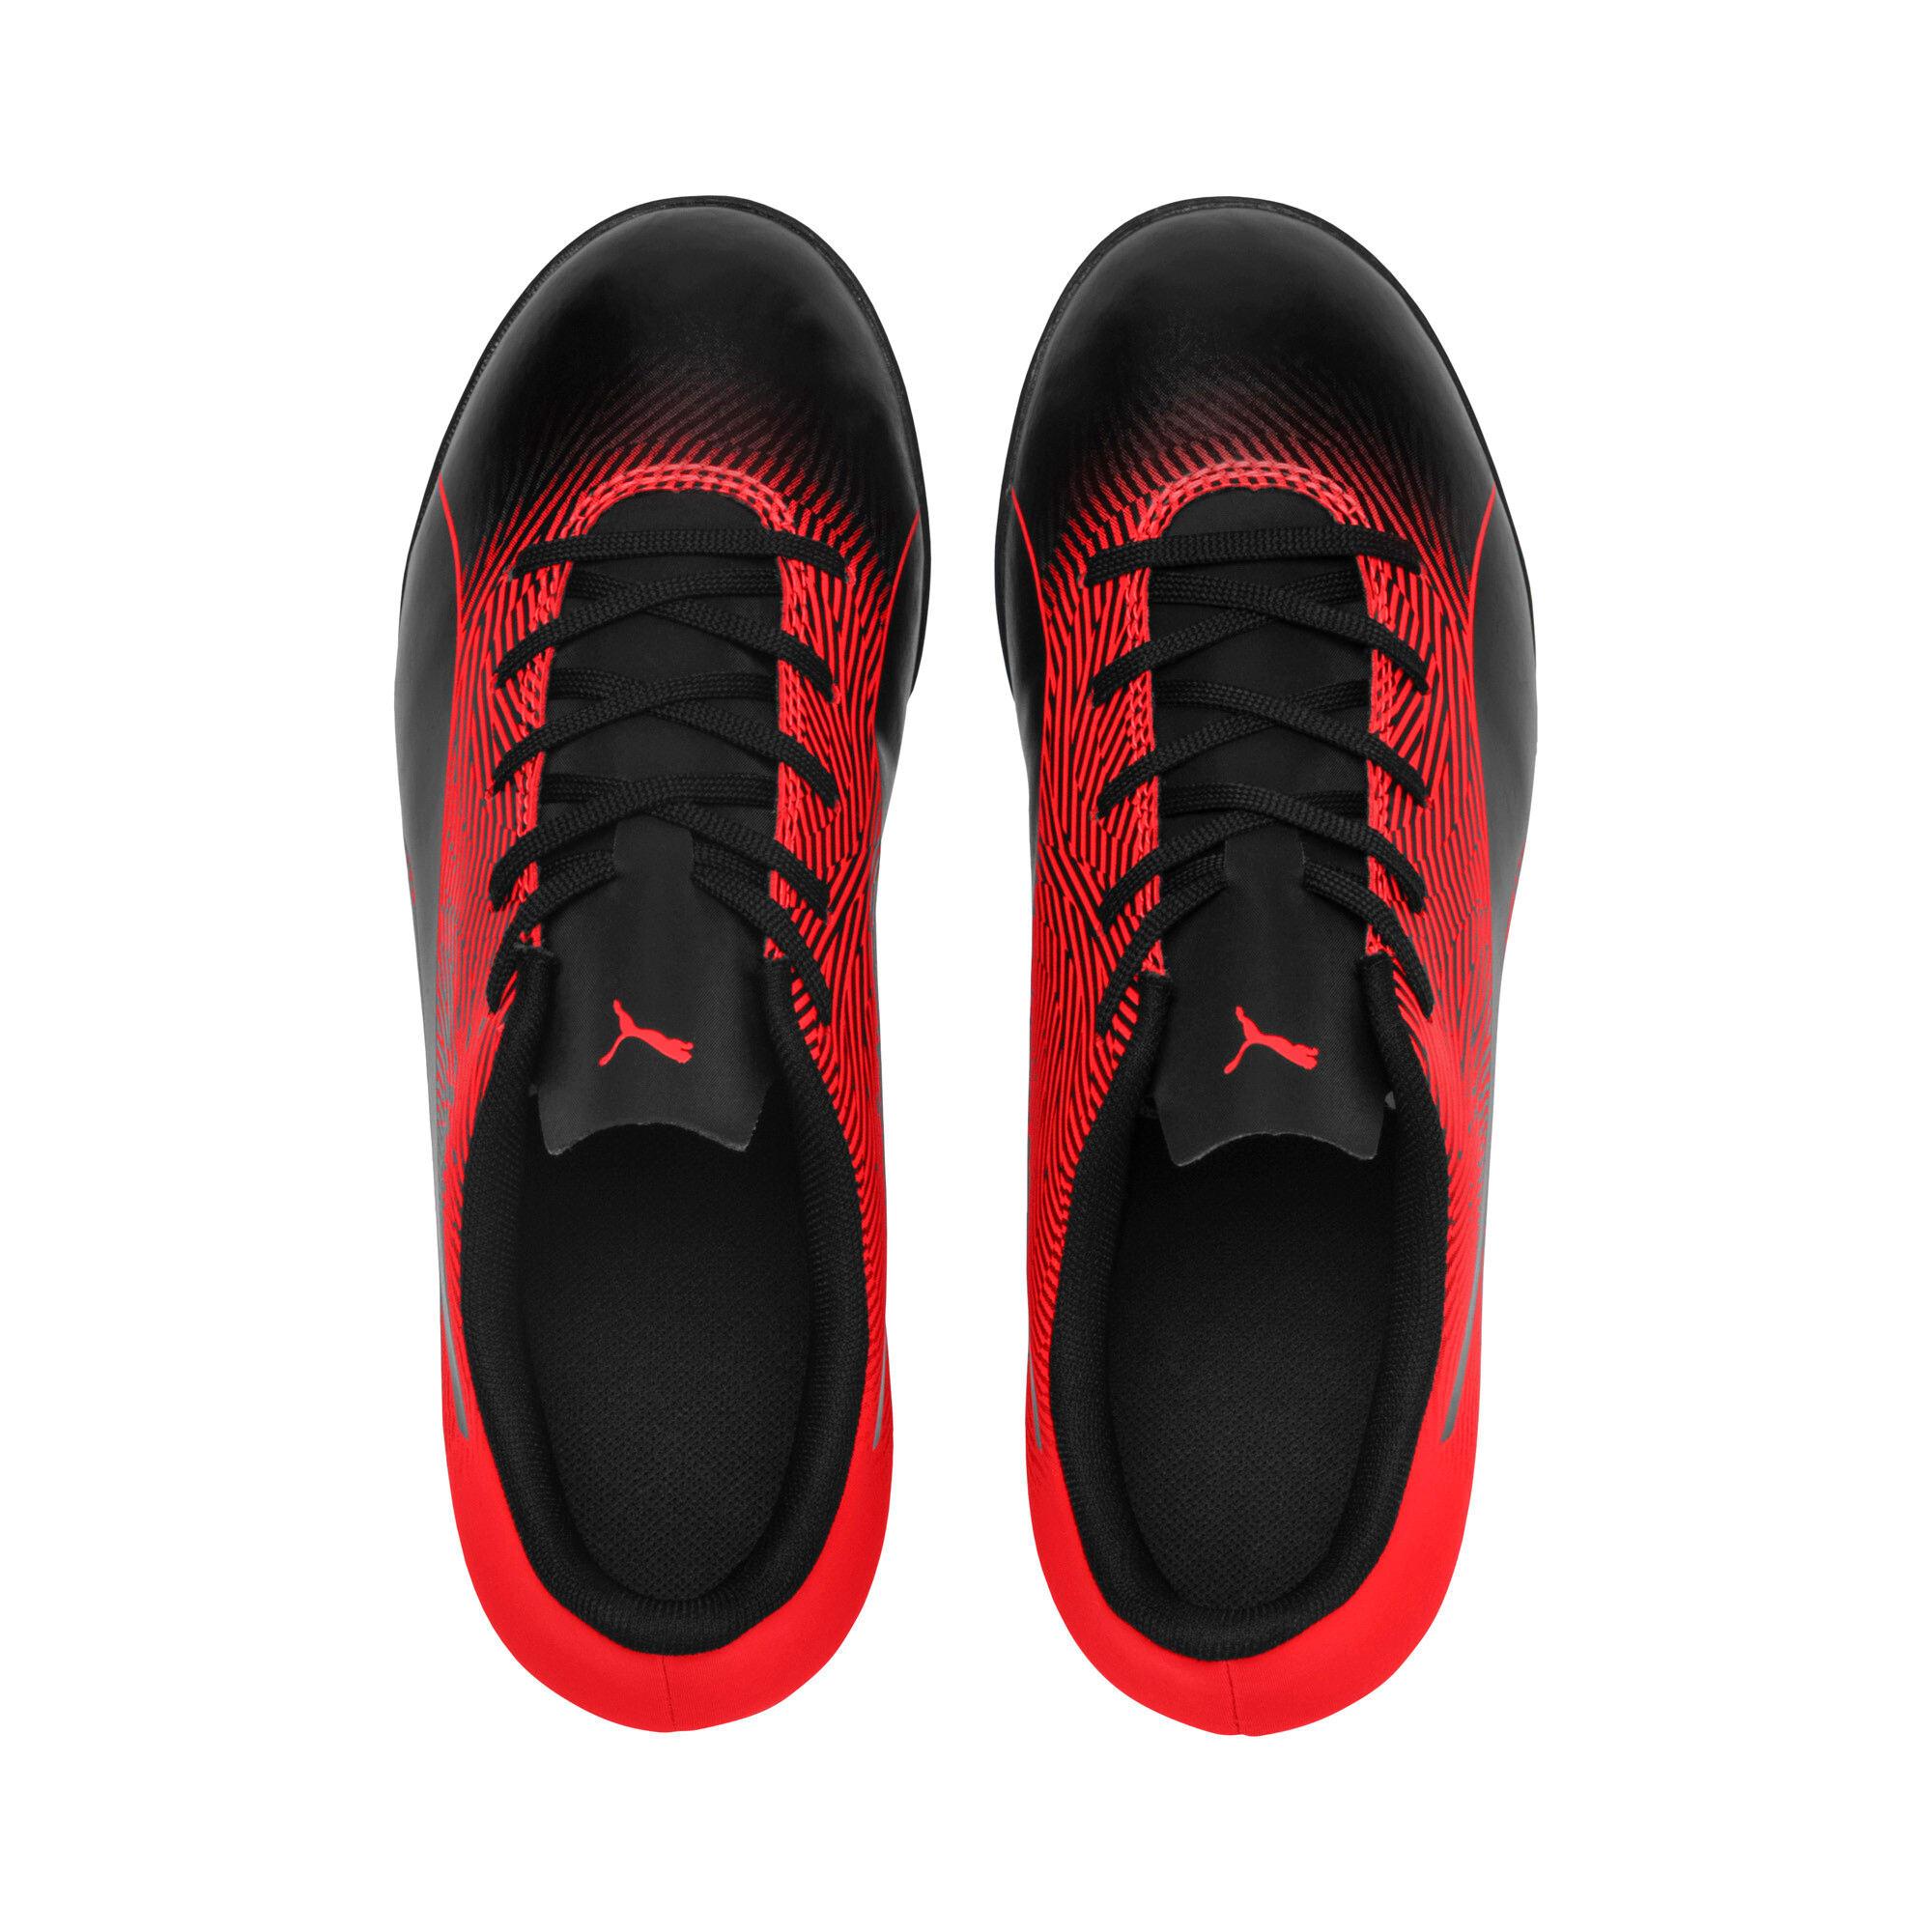 Miniatura 6 de Zapatos de fútbolPUMA Spirit II TT para JR, Puma Black-Red Blast, mediano